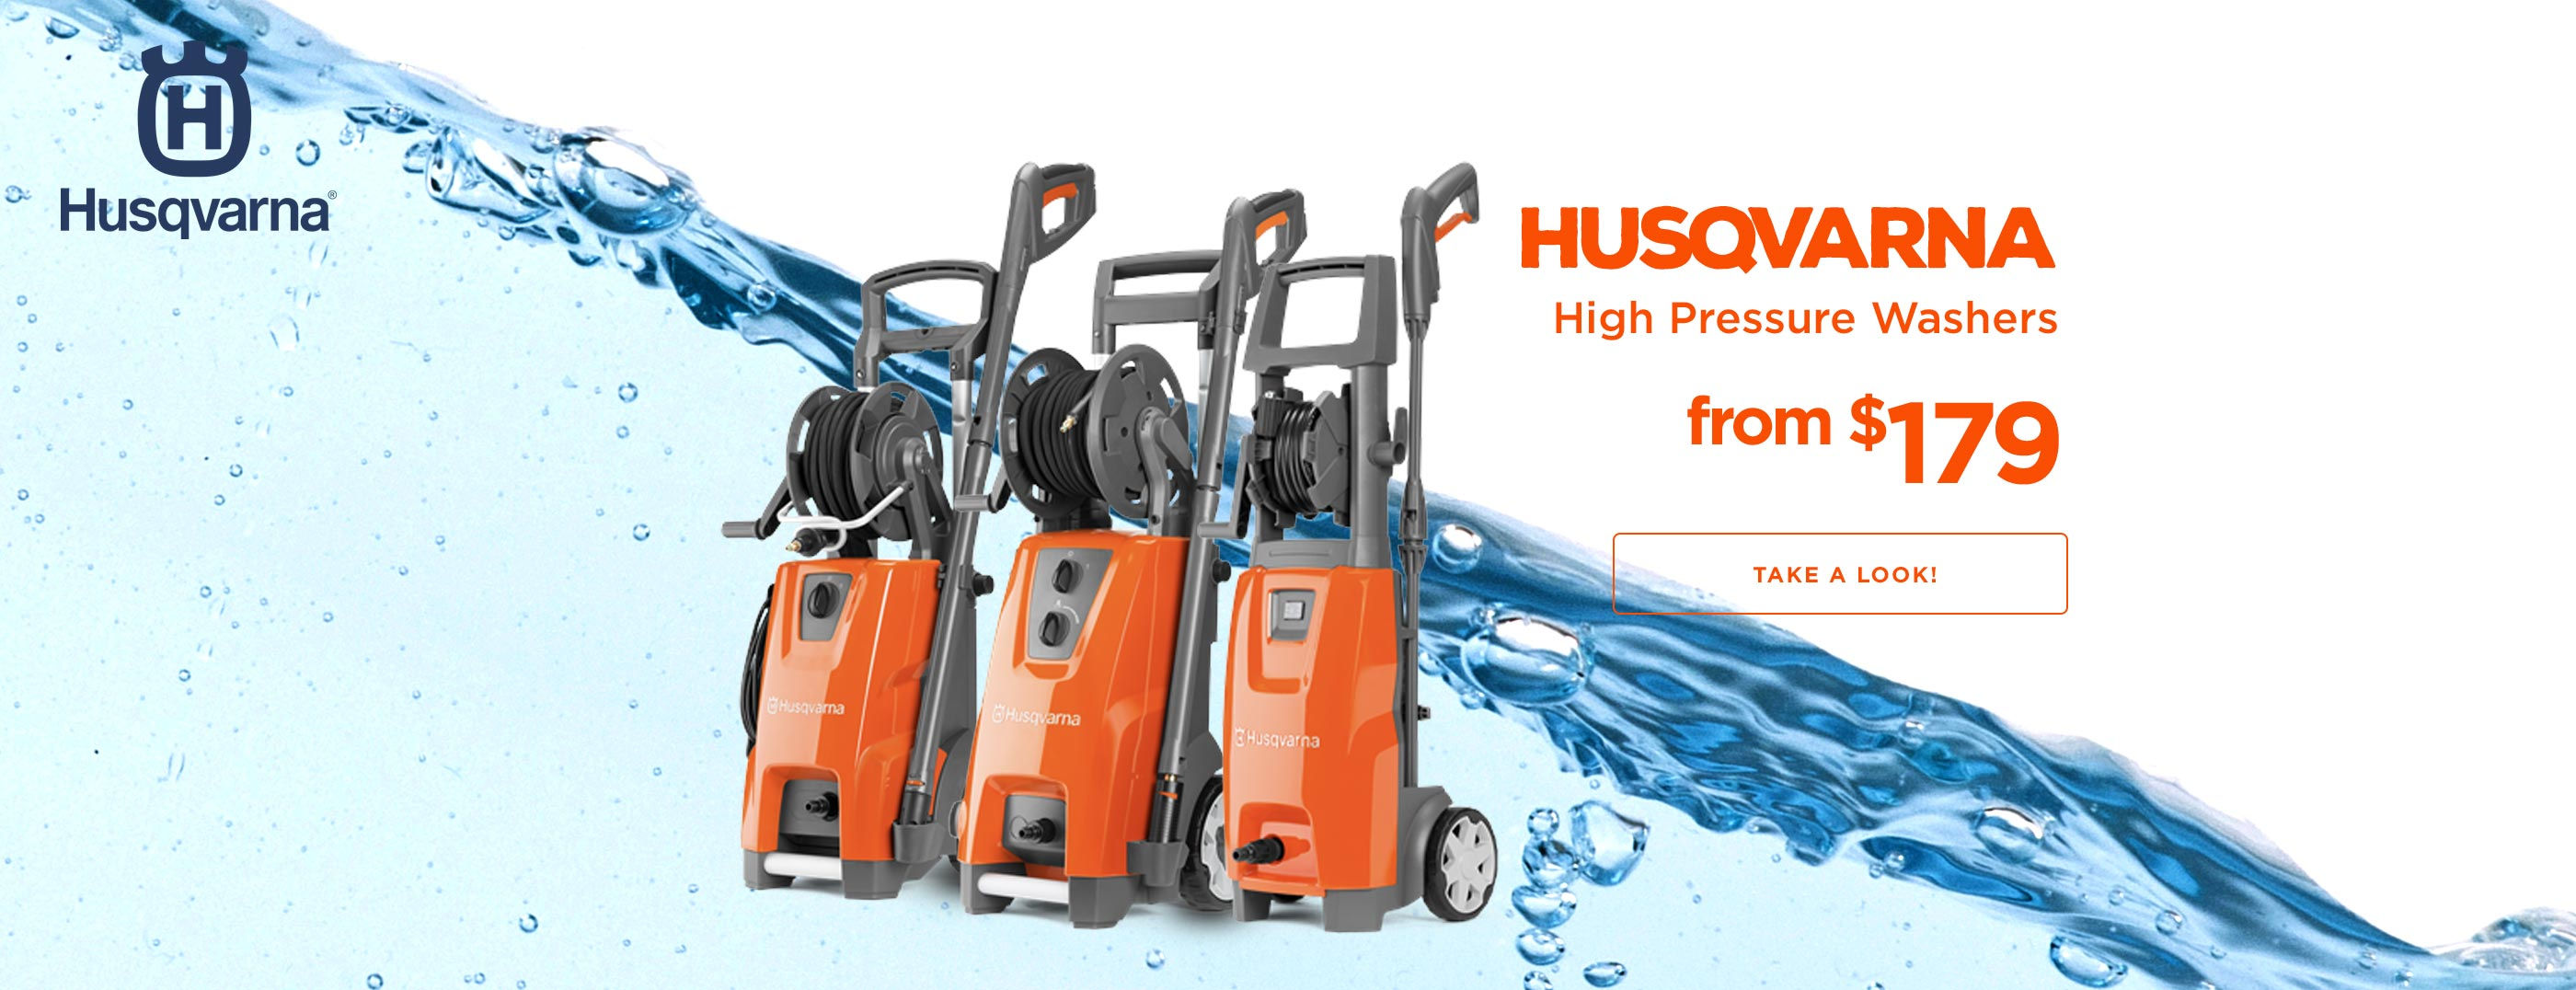 NEW Husqvarna Pressure Washers from $179